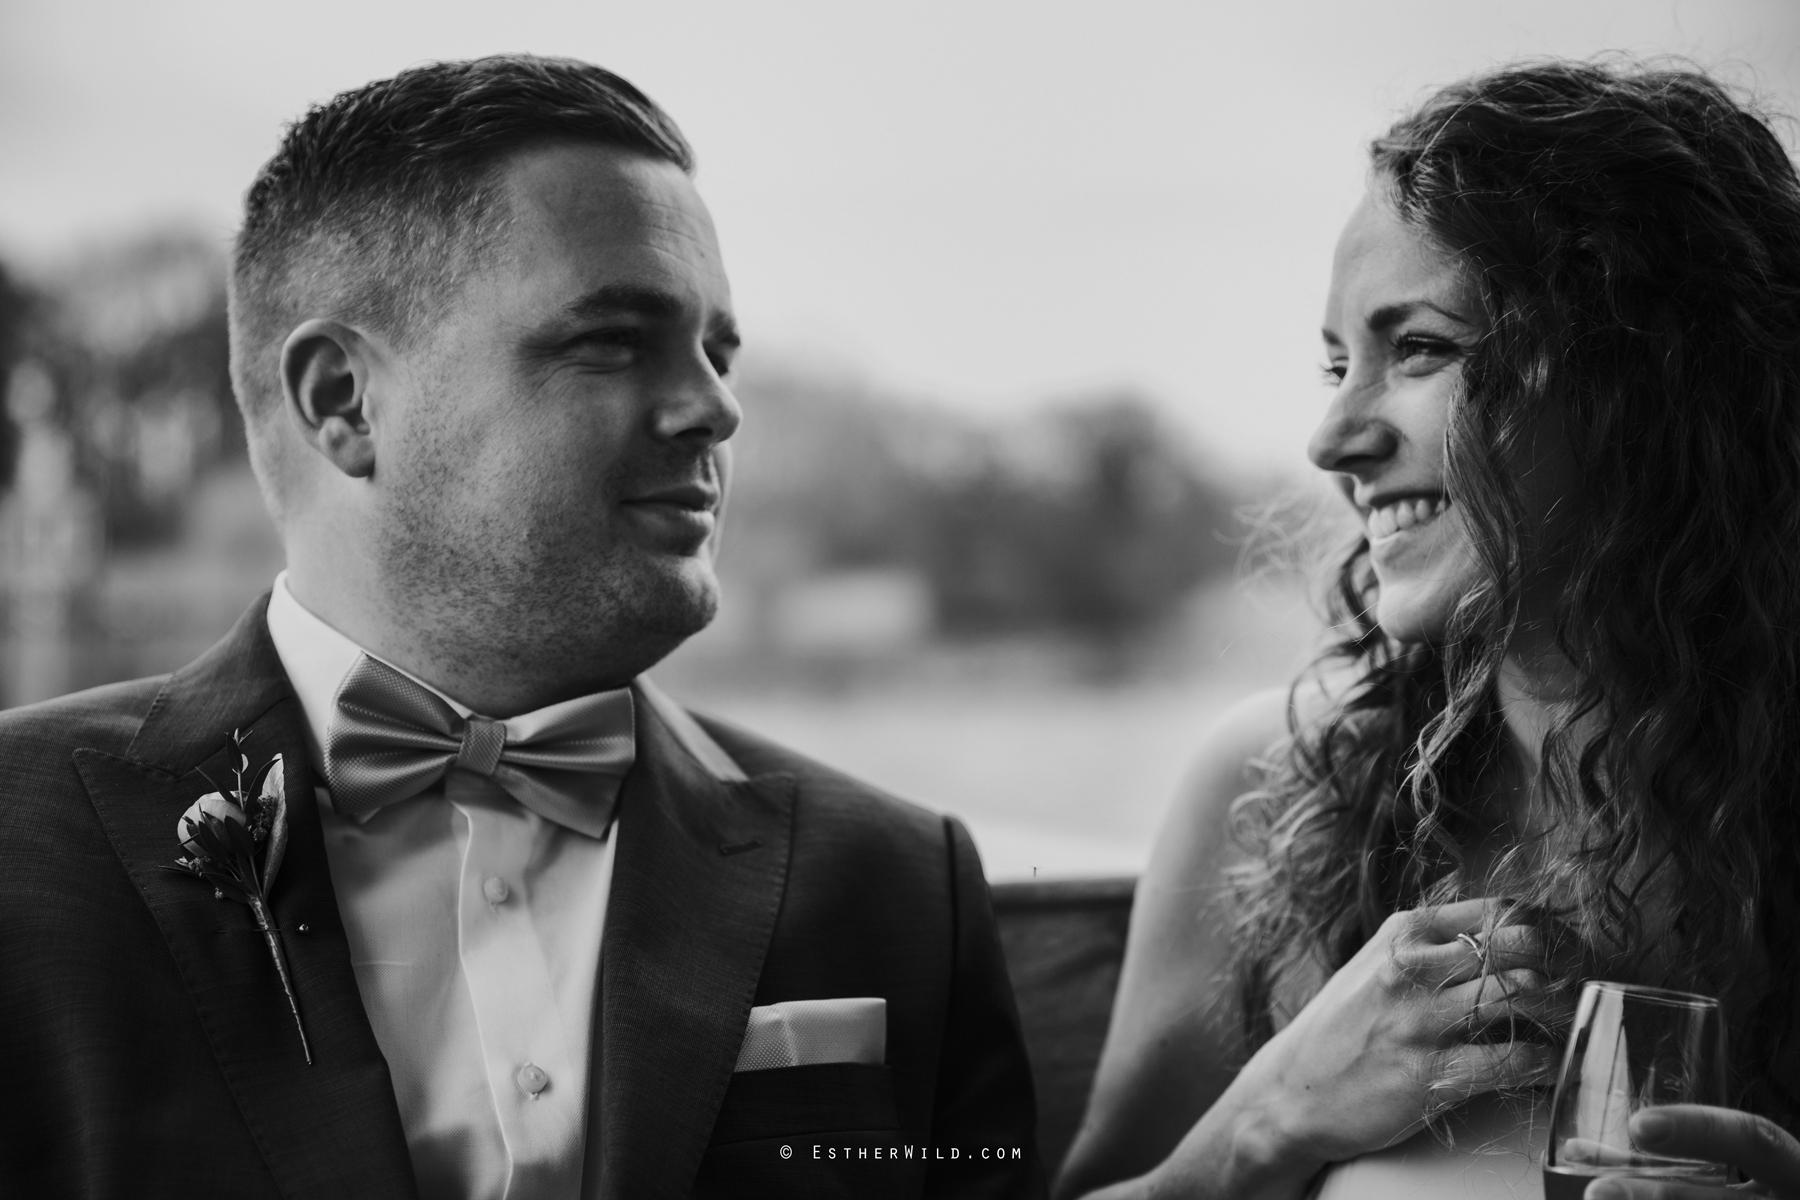 The_BoatHouse_Wedding_Venue_Ormesby_Norfolk_Broads_Boat_Wedding_Photography_Esther_Wild_Photographer_IMG_1619-2.jpg